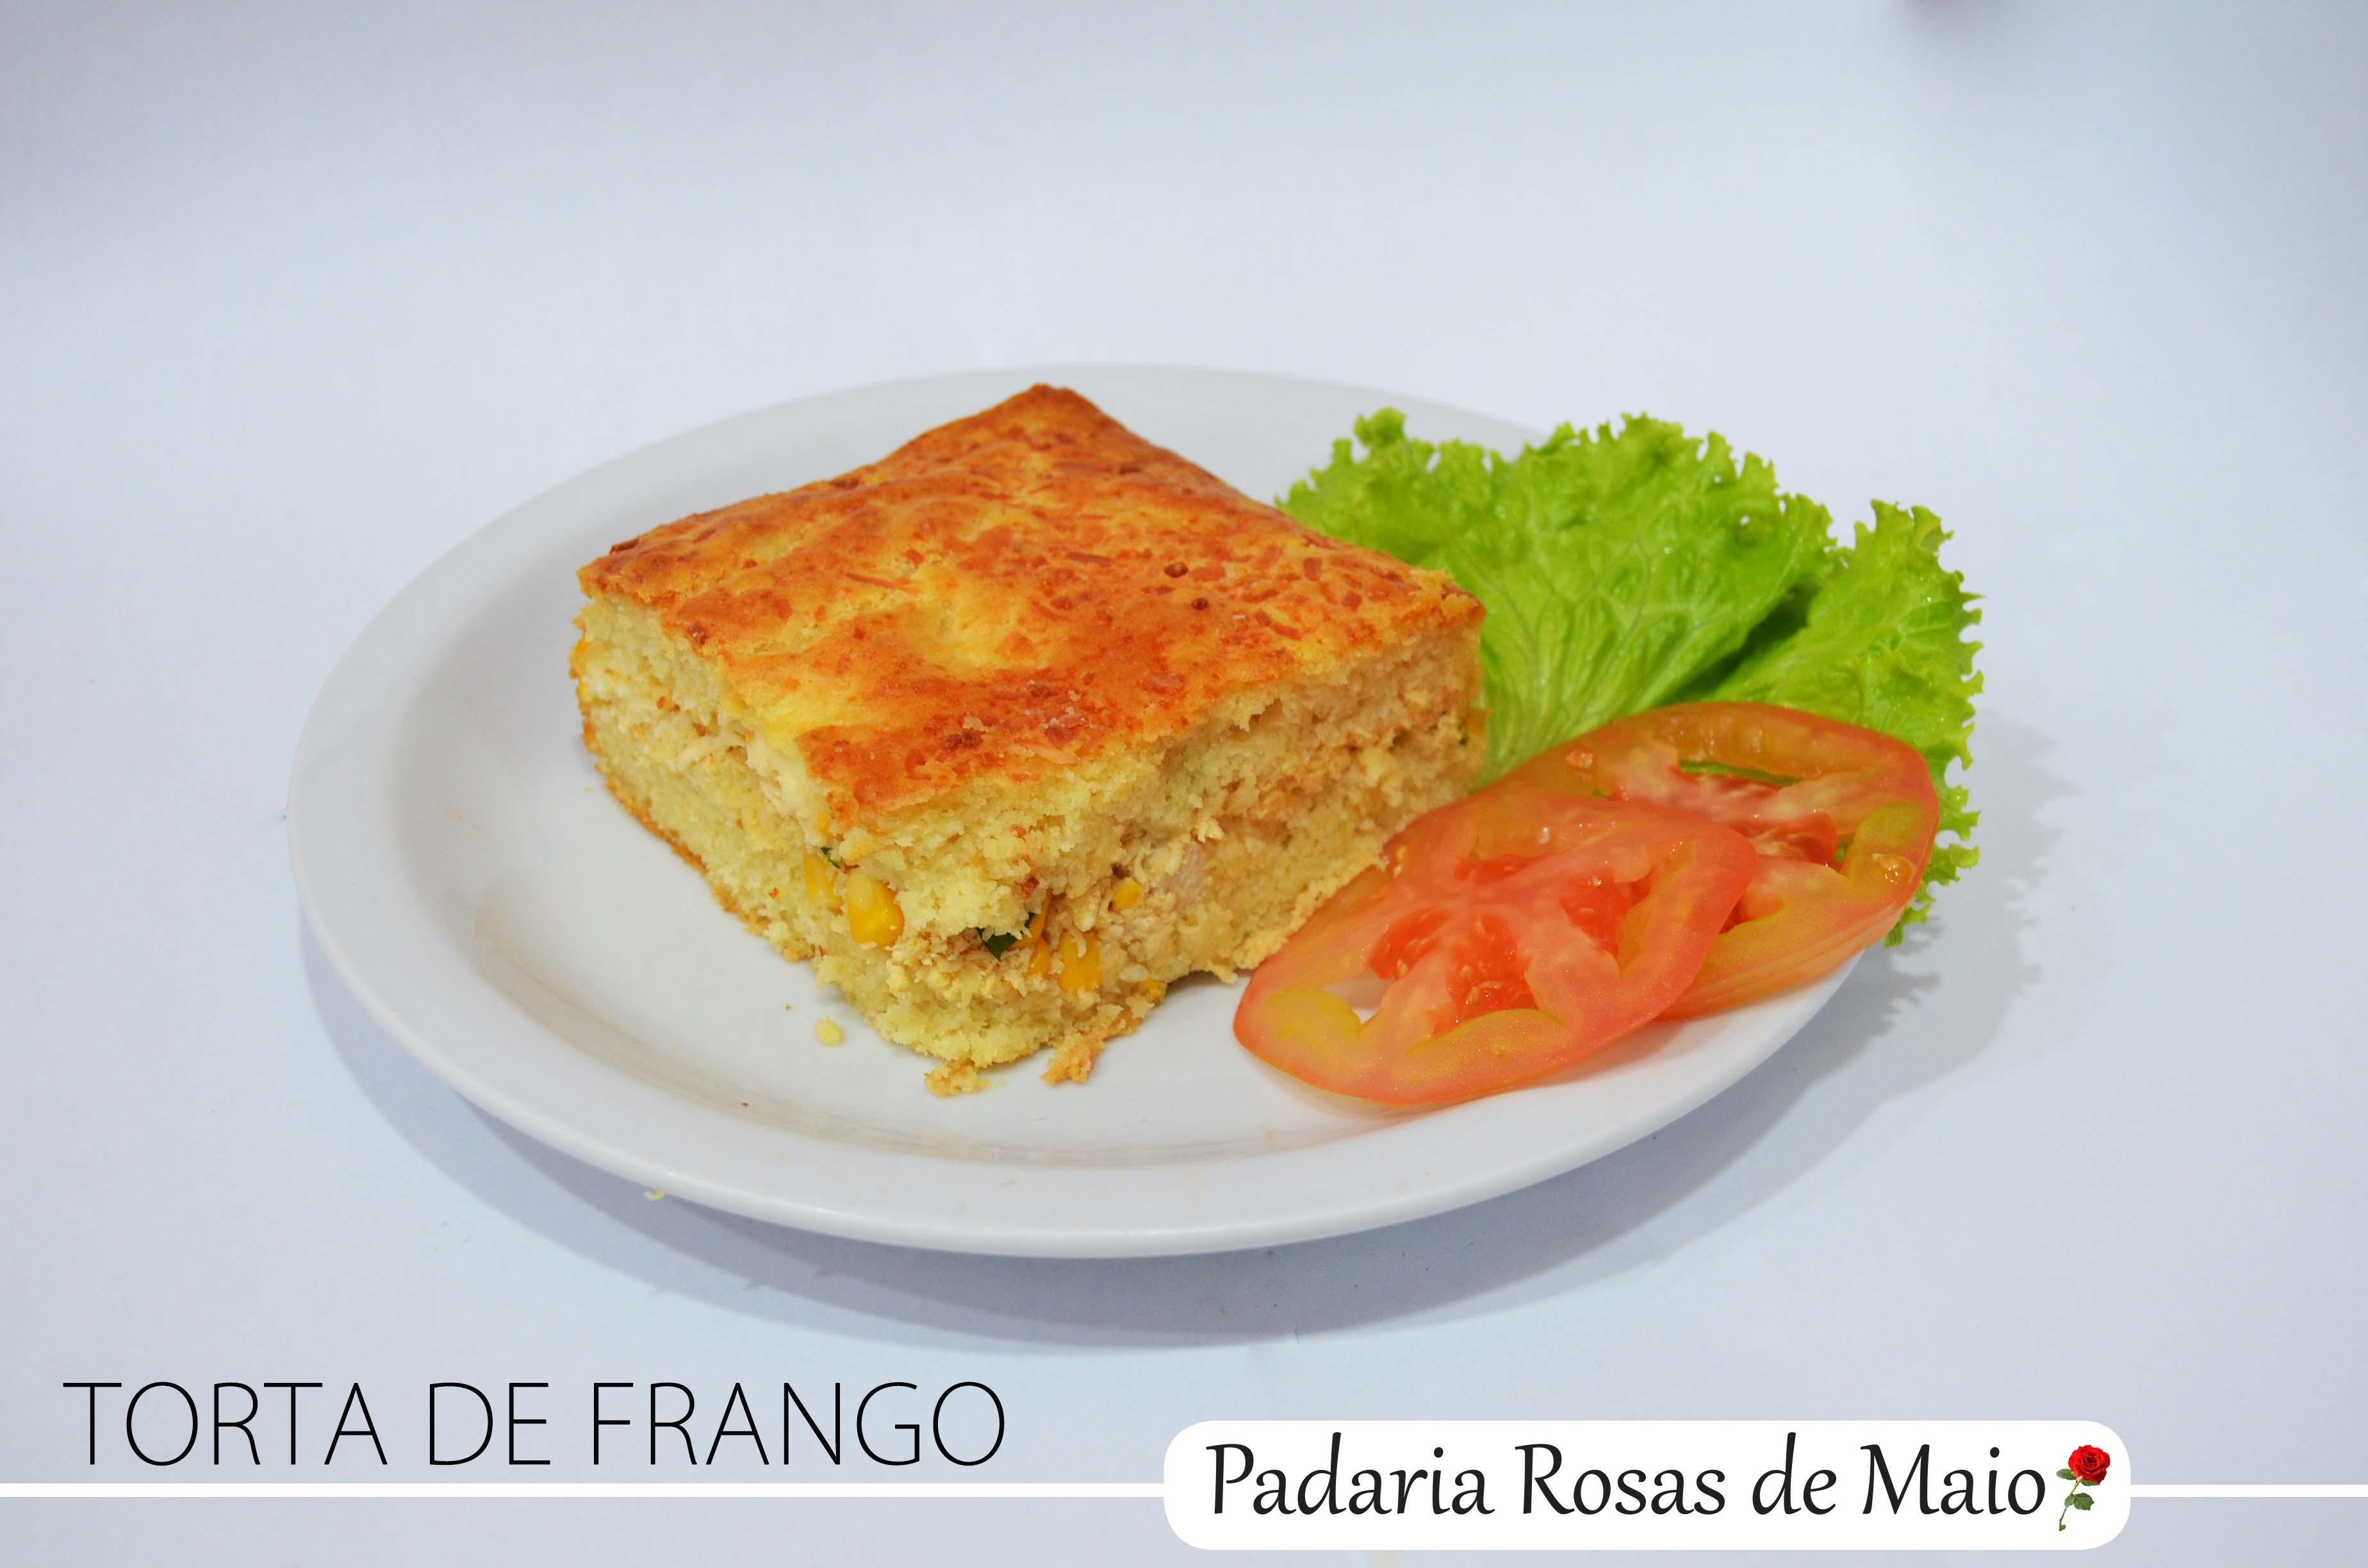 24. lanchinho 2 (TORTA DE FRANGO)